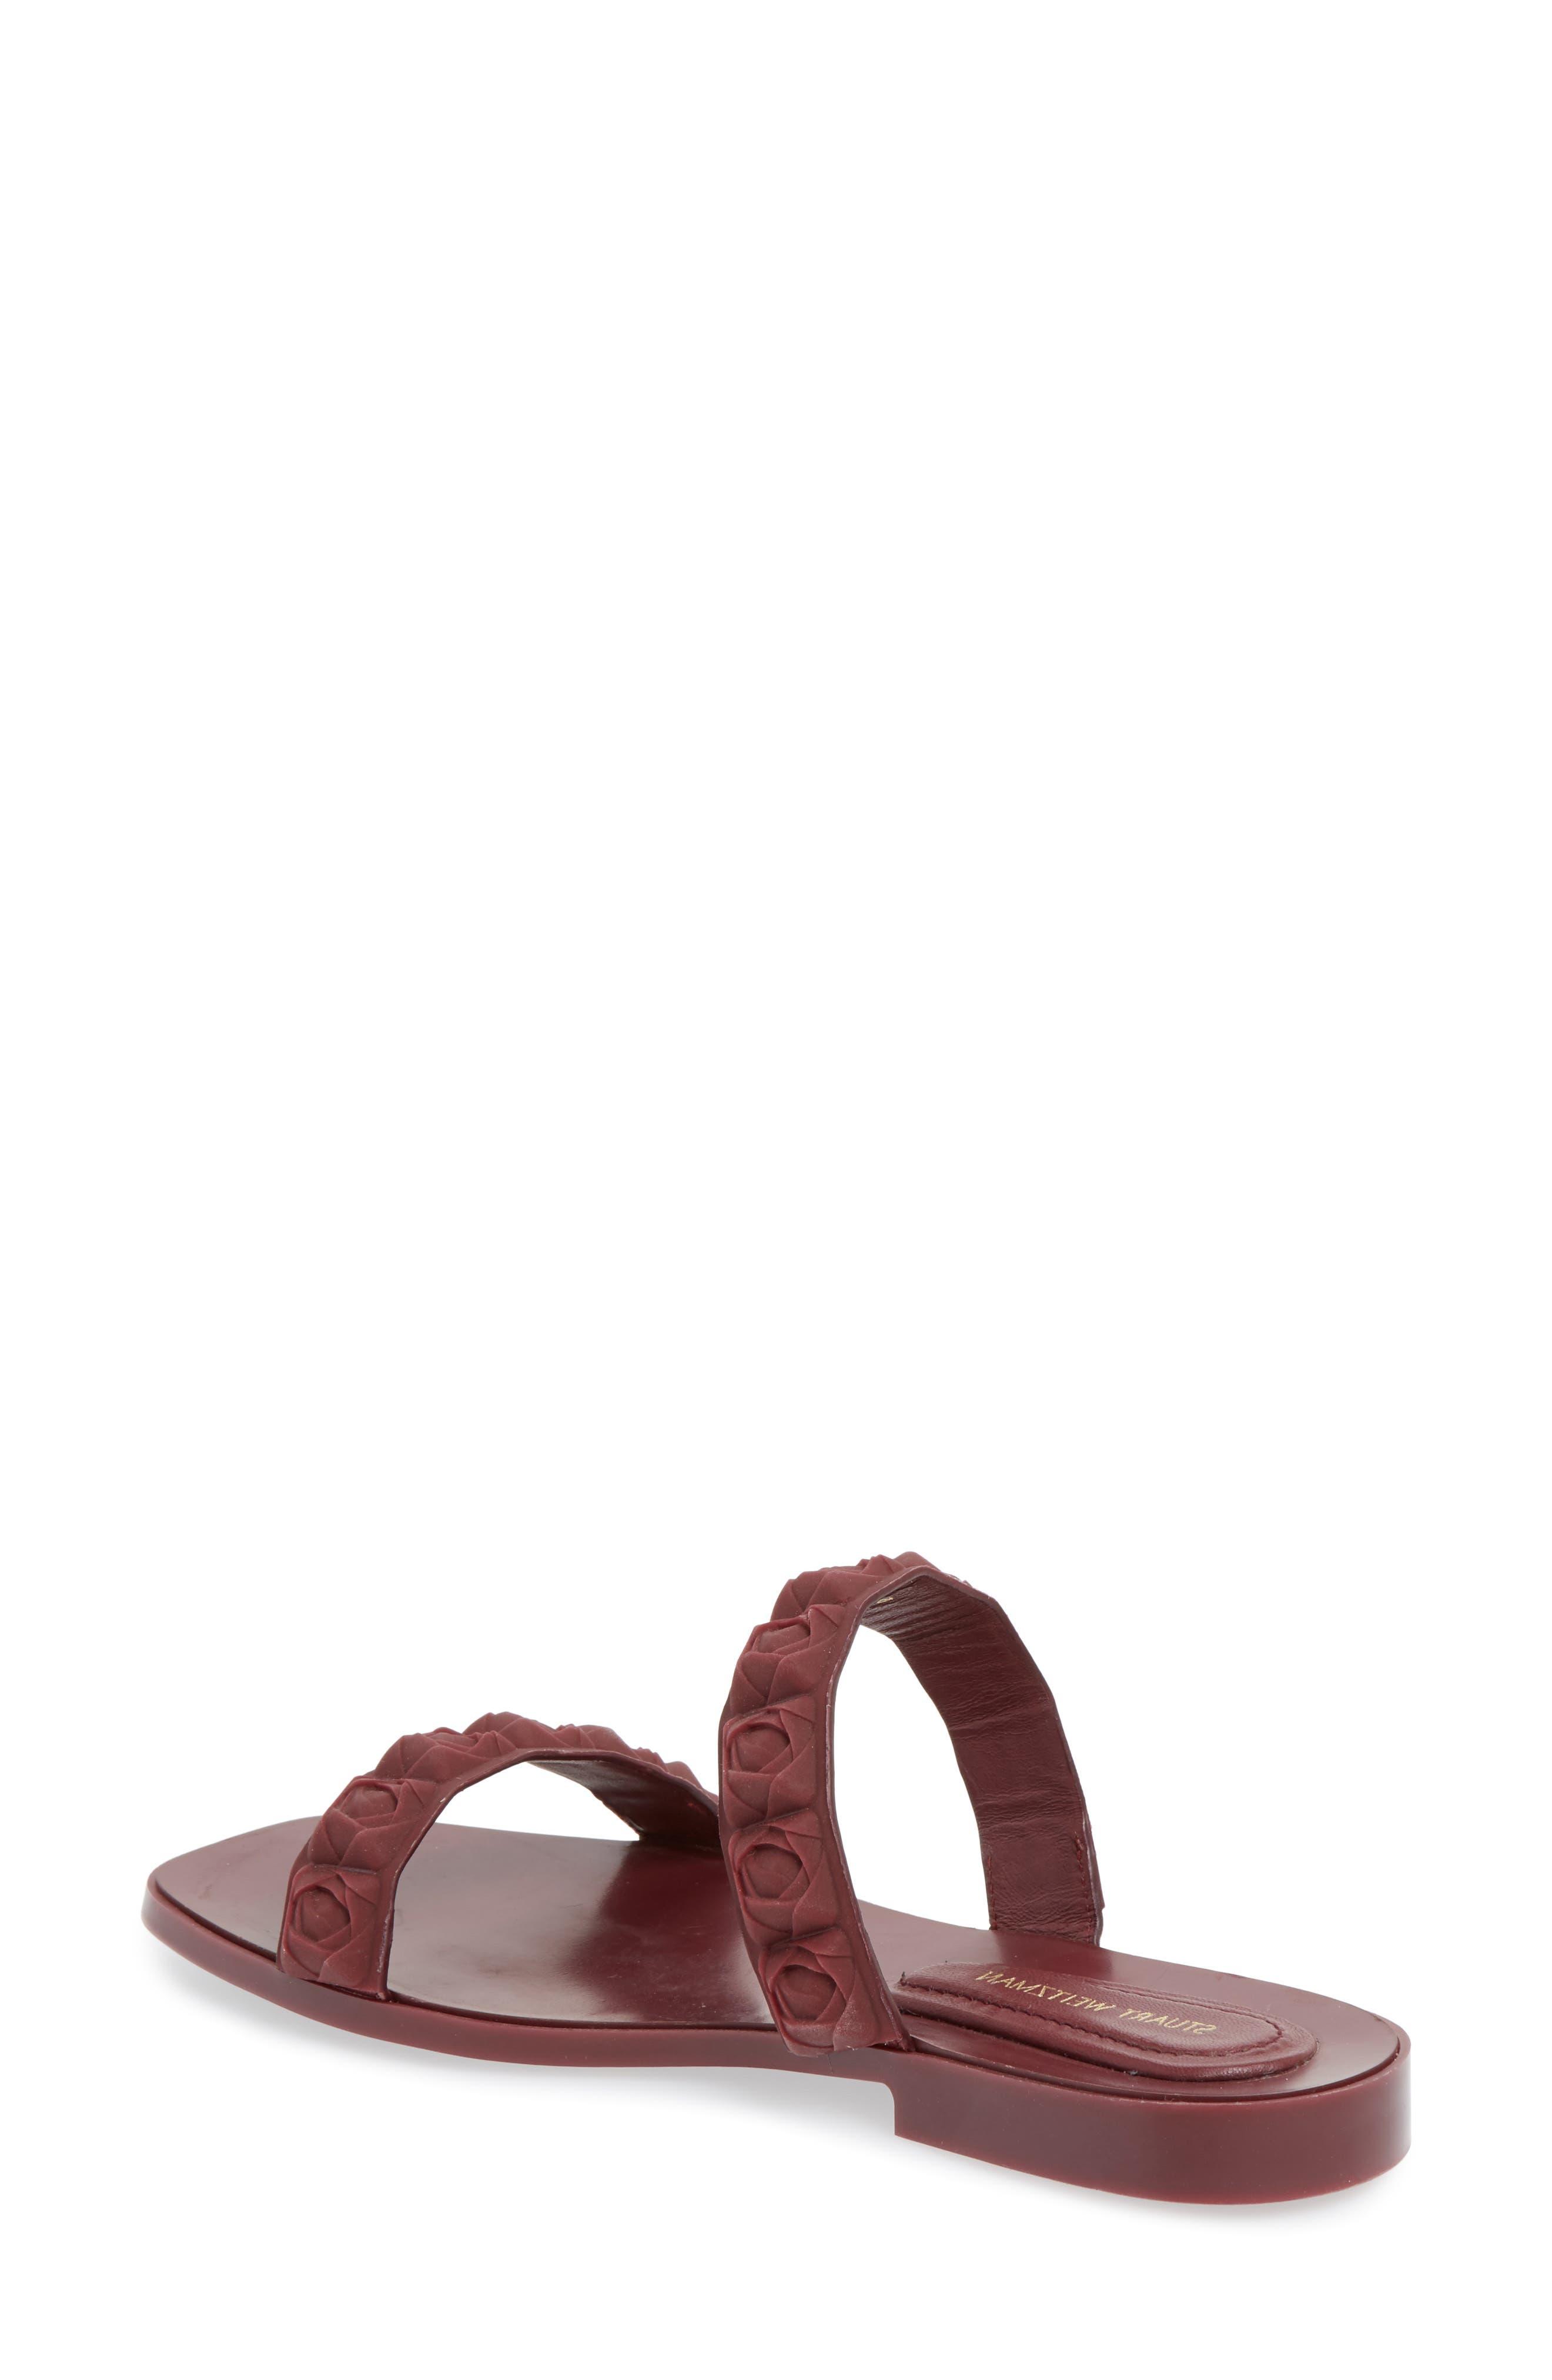 Rosita Dual Strap Slide Sandal,                             Alternate thumbnail 12, color,